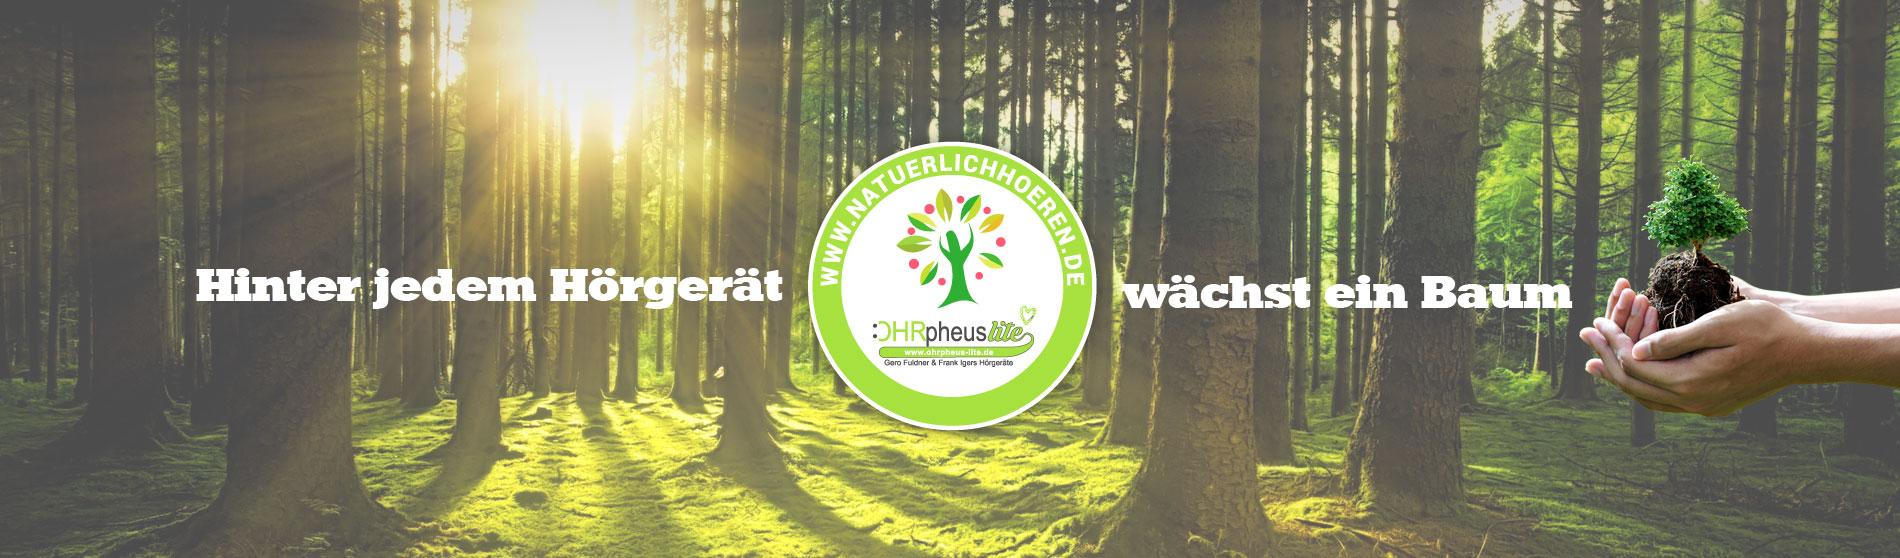 OHRpheus lite Umweltaktion Slider